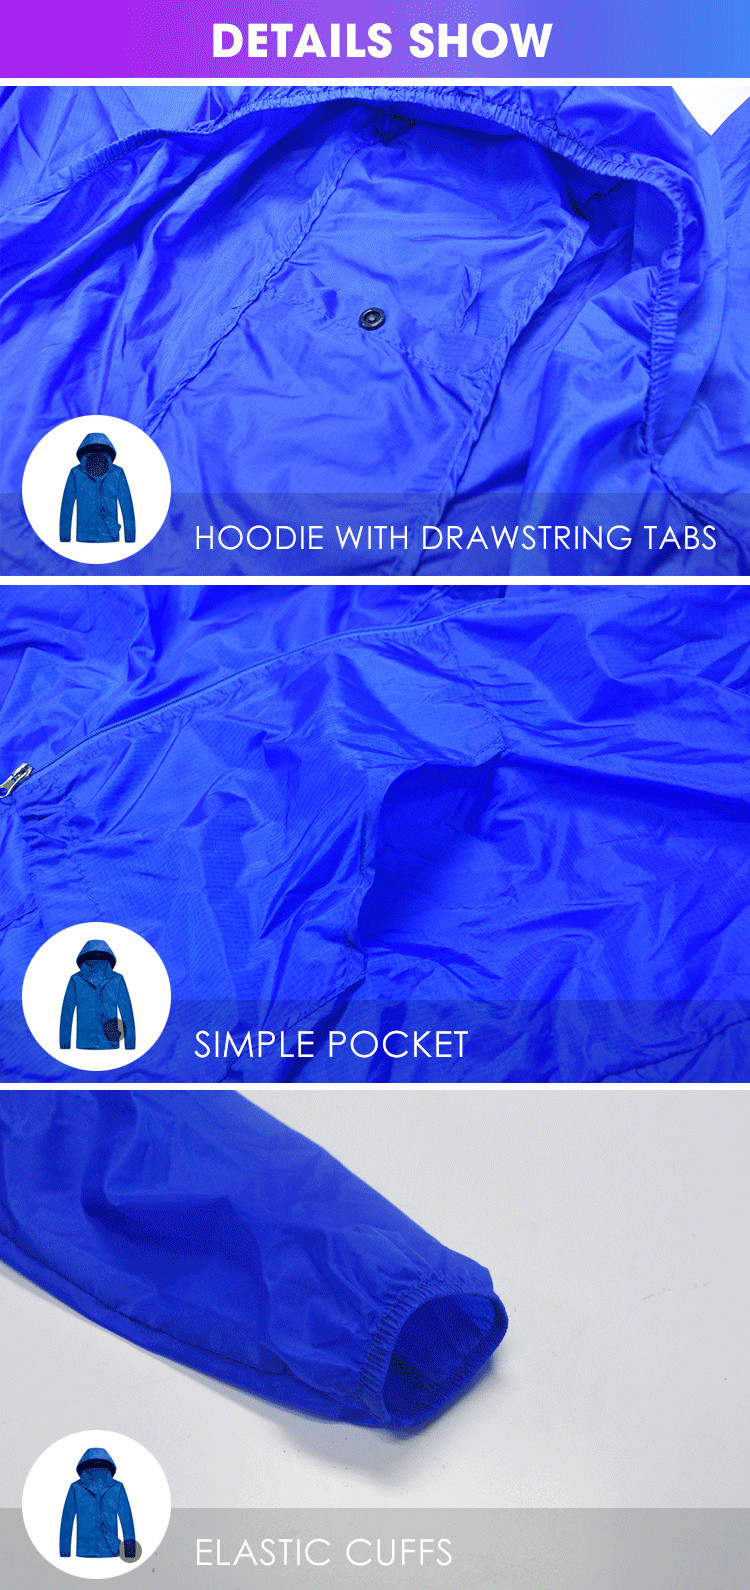 anti uv protective jacket